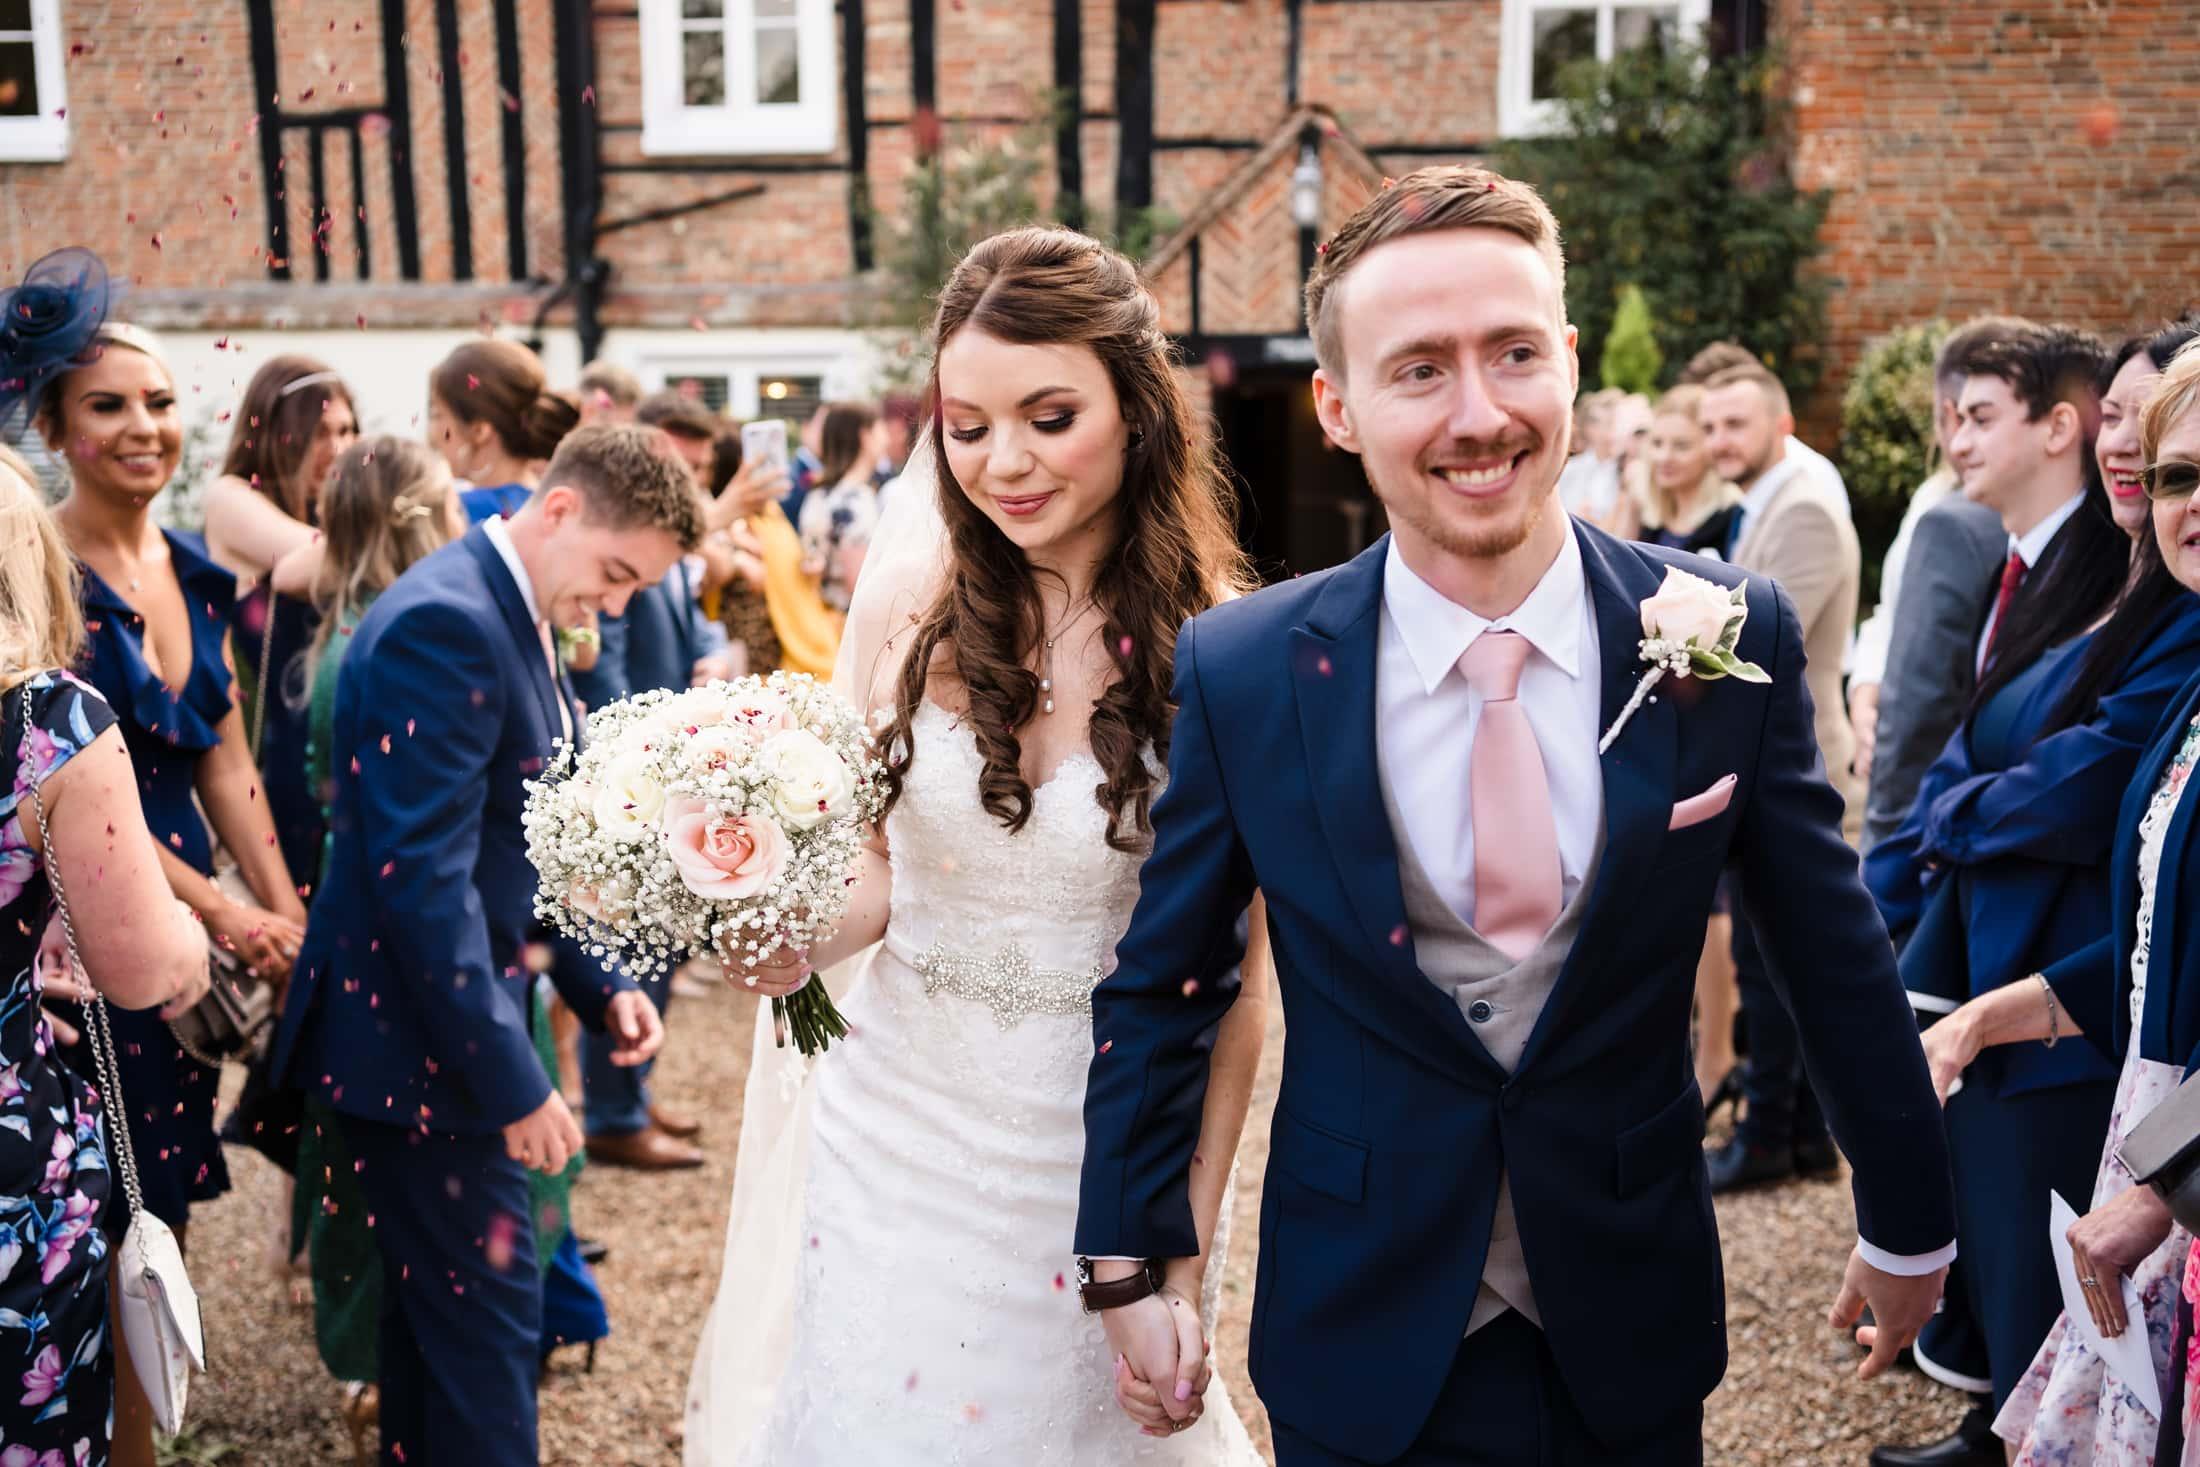 Essex Wedding Photographer - Zoe & James